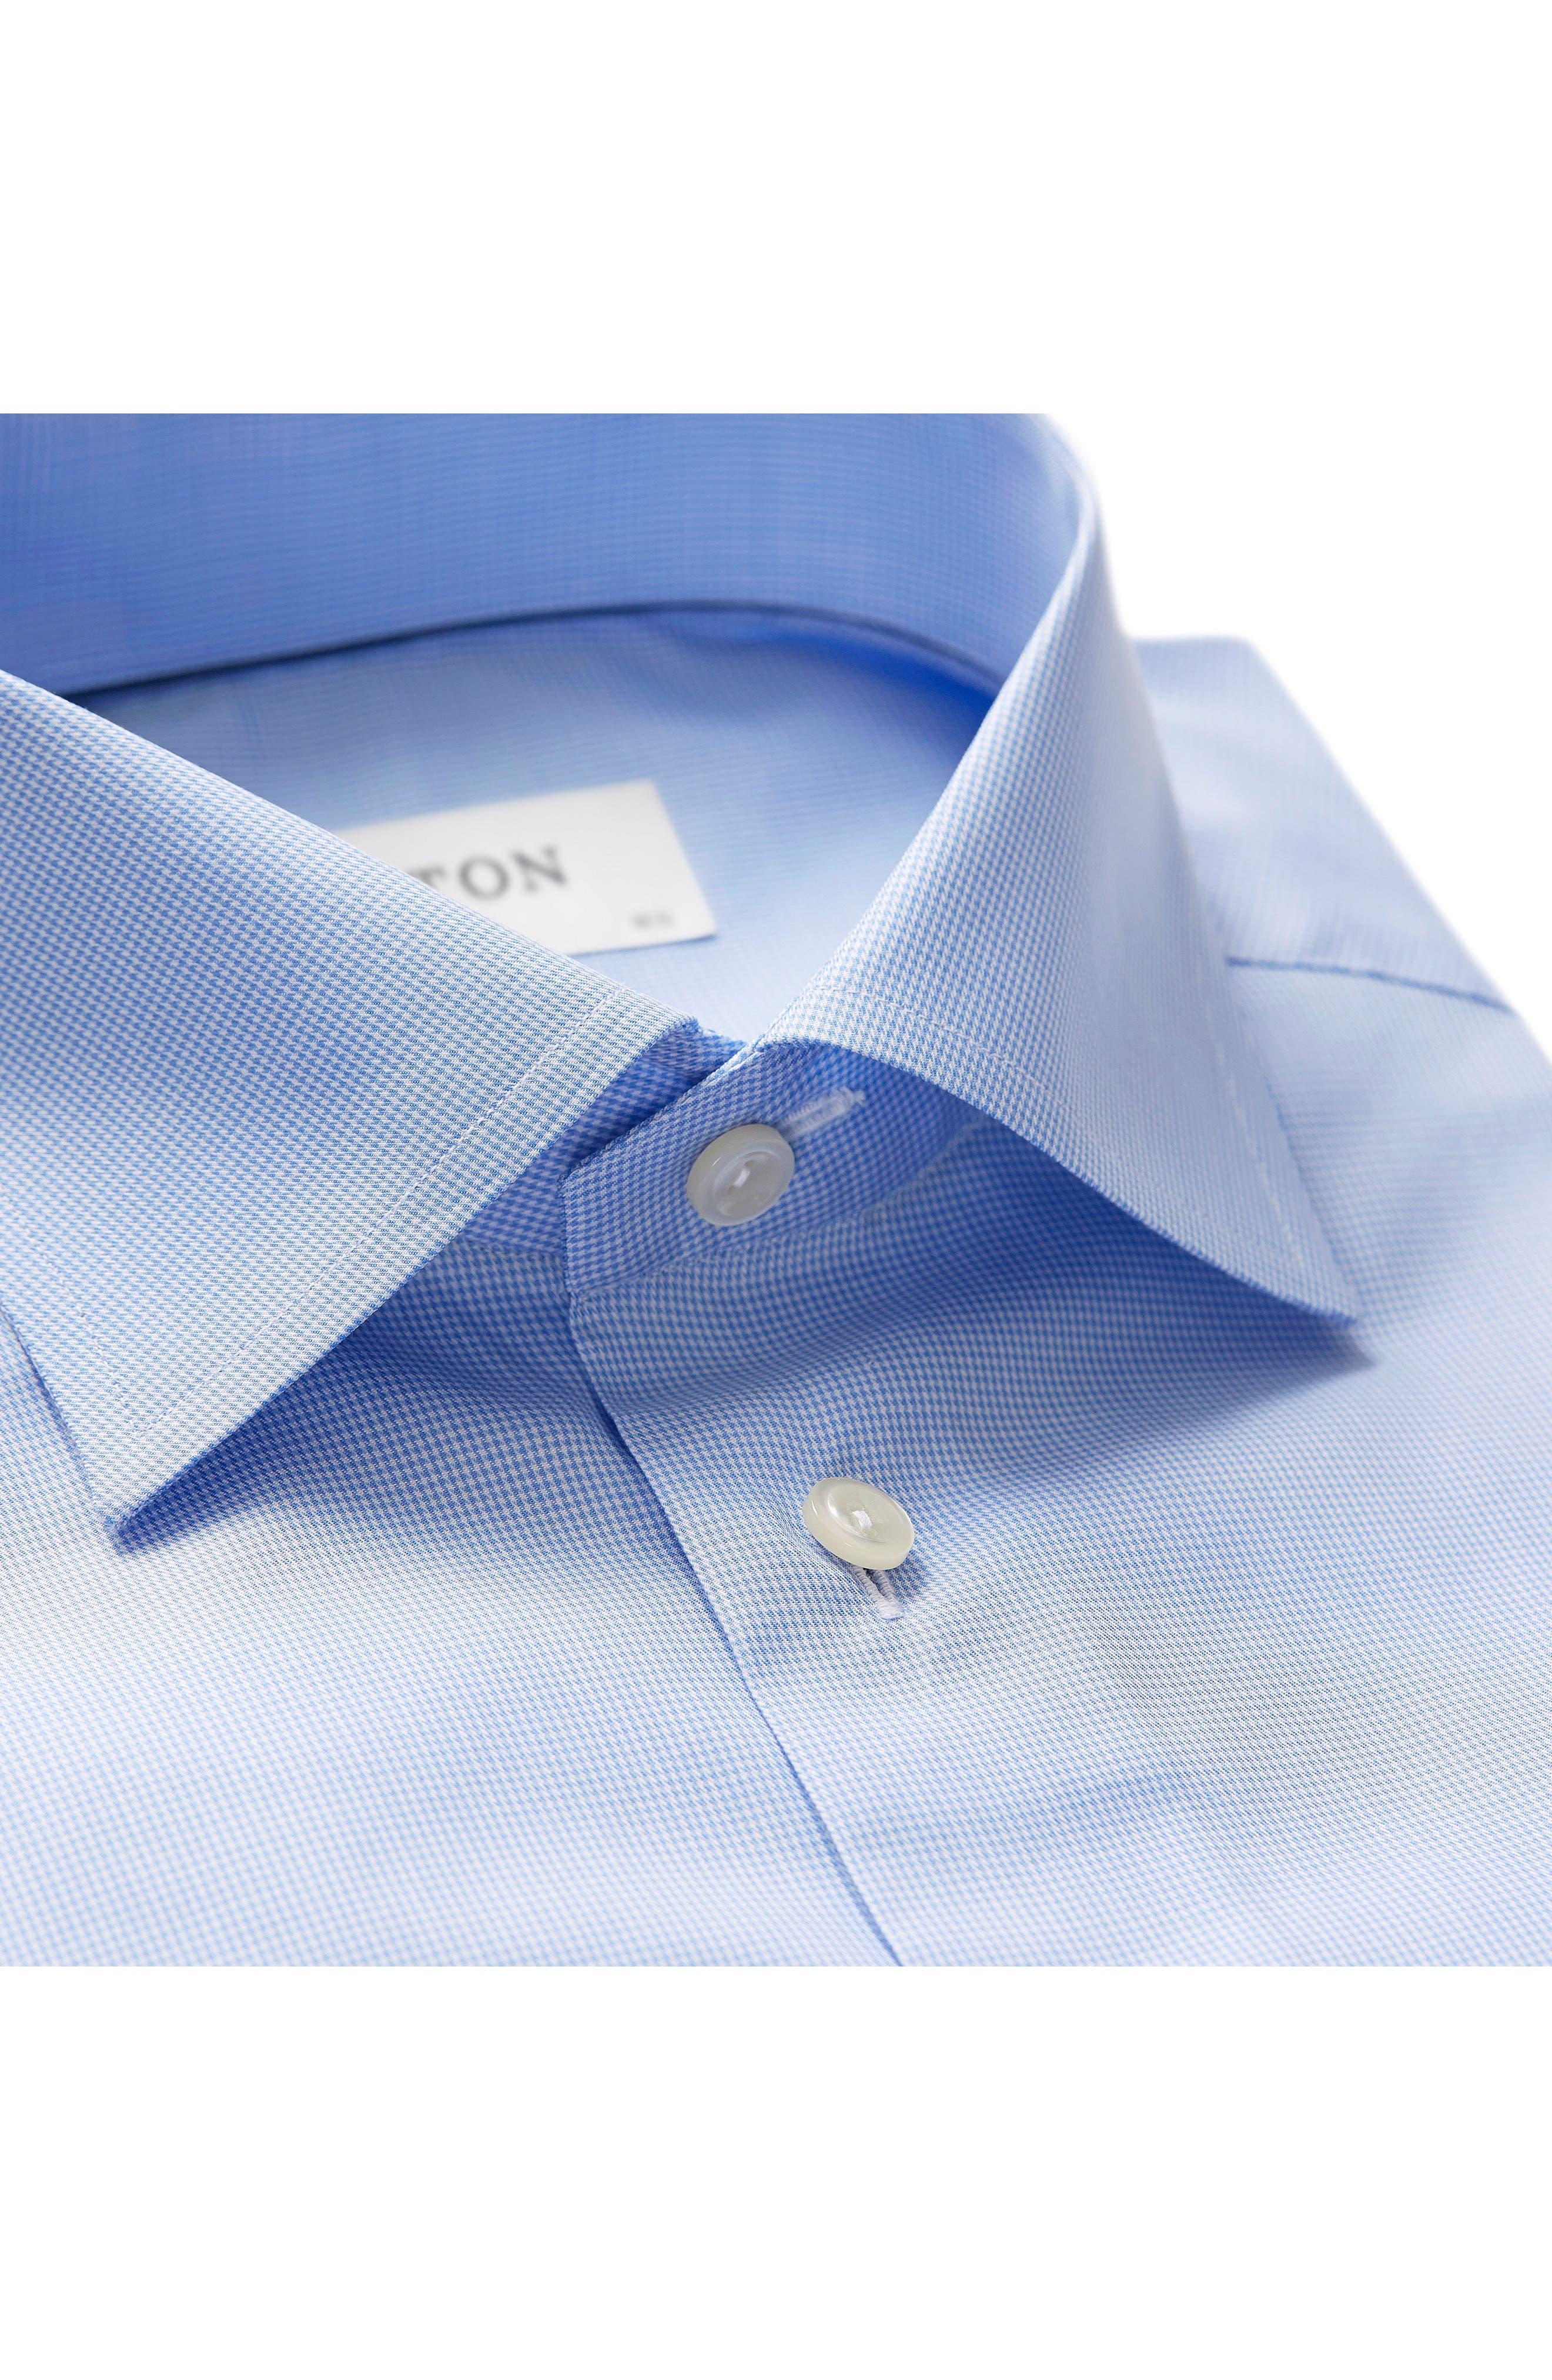 Slim Fit Houndstooth Dress Shirt,                             Alternate thumbnail 2, color,                             Blue